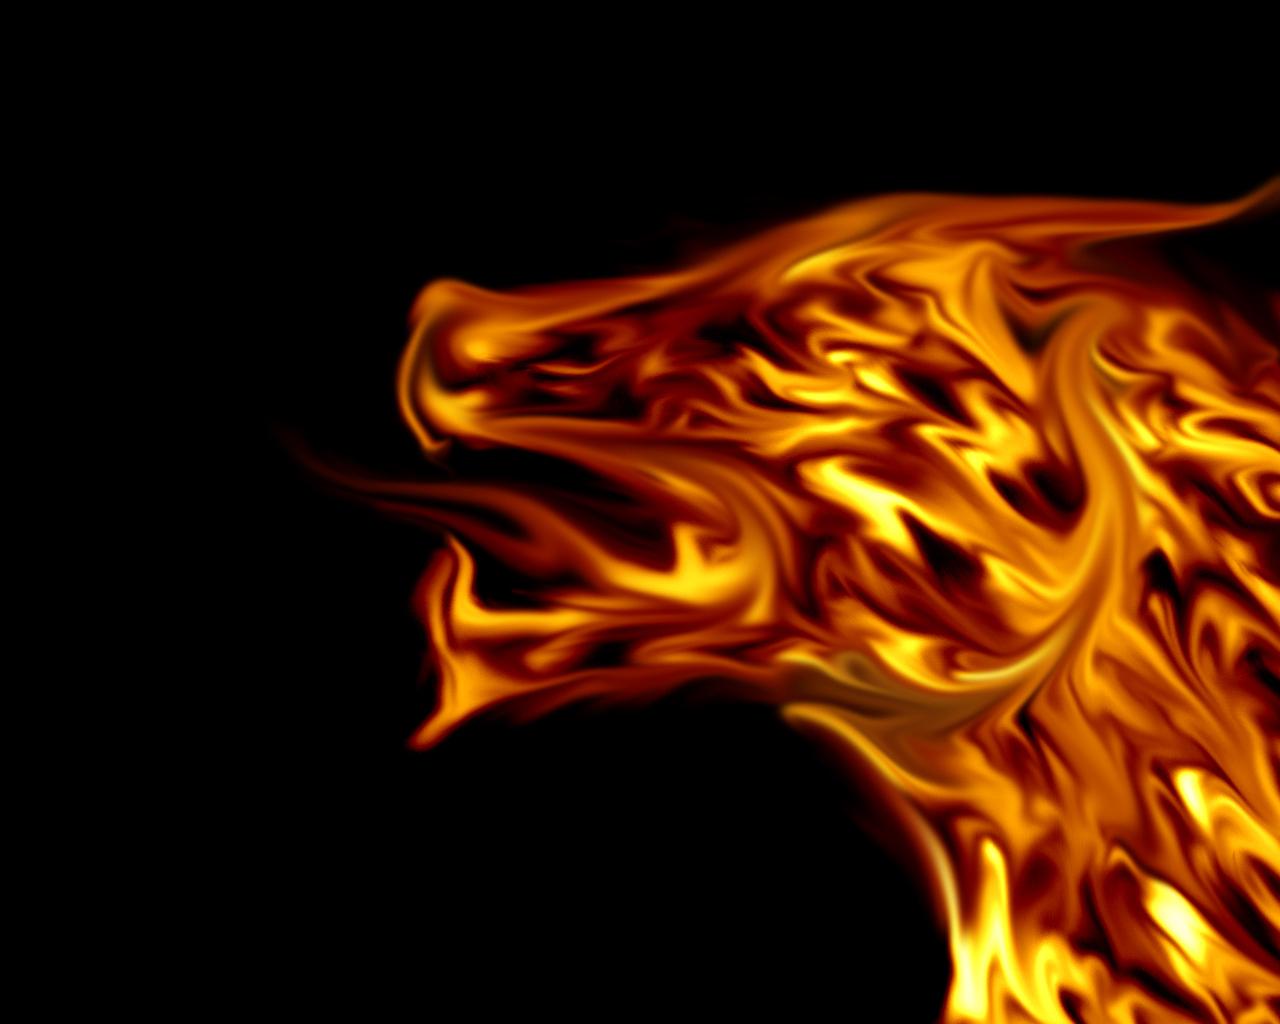 Charming Fire Dragon Funkyrach01 Wallpaper 16754539 1280x1024